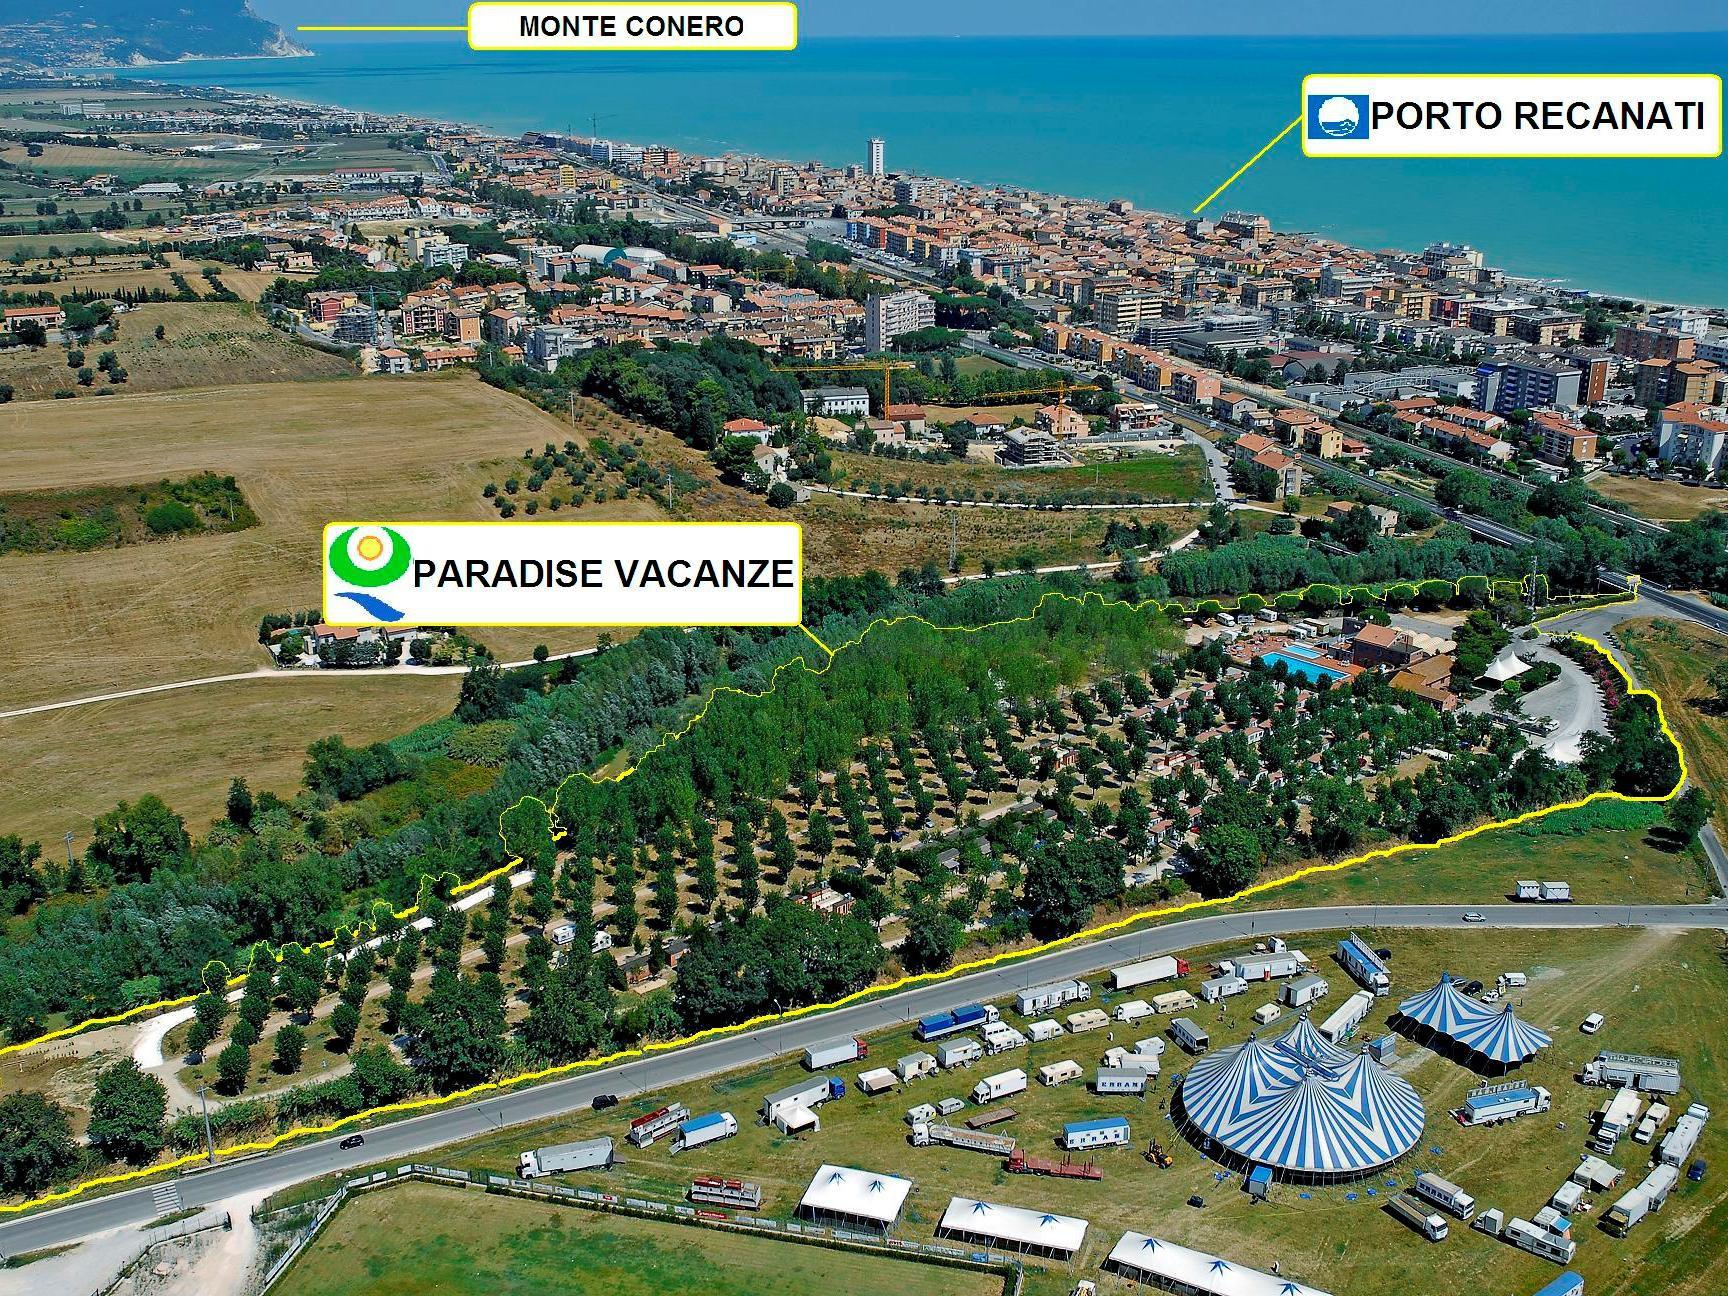 Villaggio Paradise Vacanze